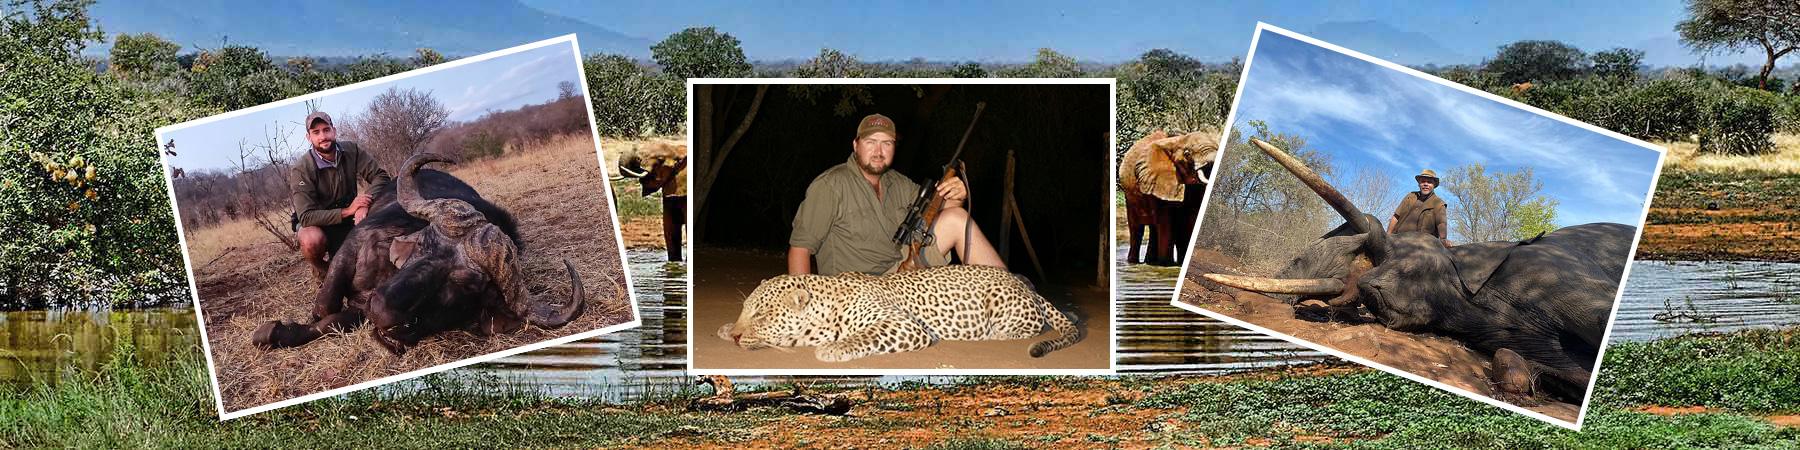 Home-page-buffalo-leopard-elephant-banner-1